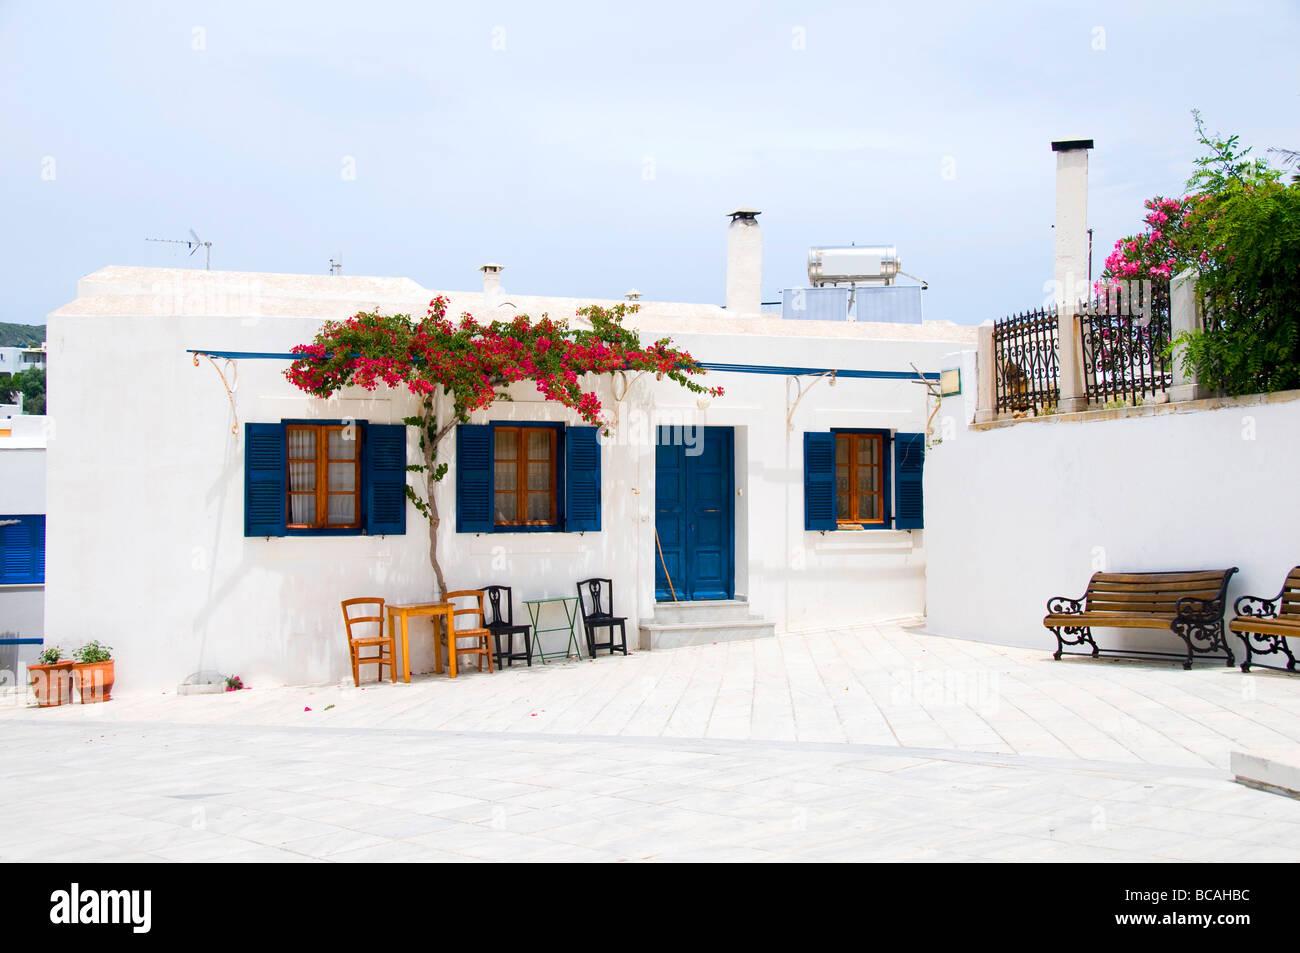 Cafe greece outdoor restaurant coffee shop greek islands